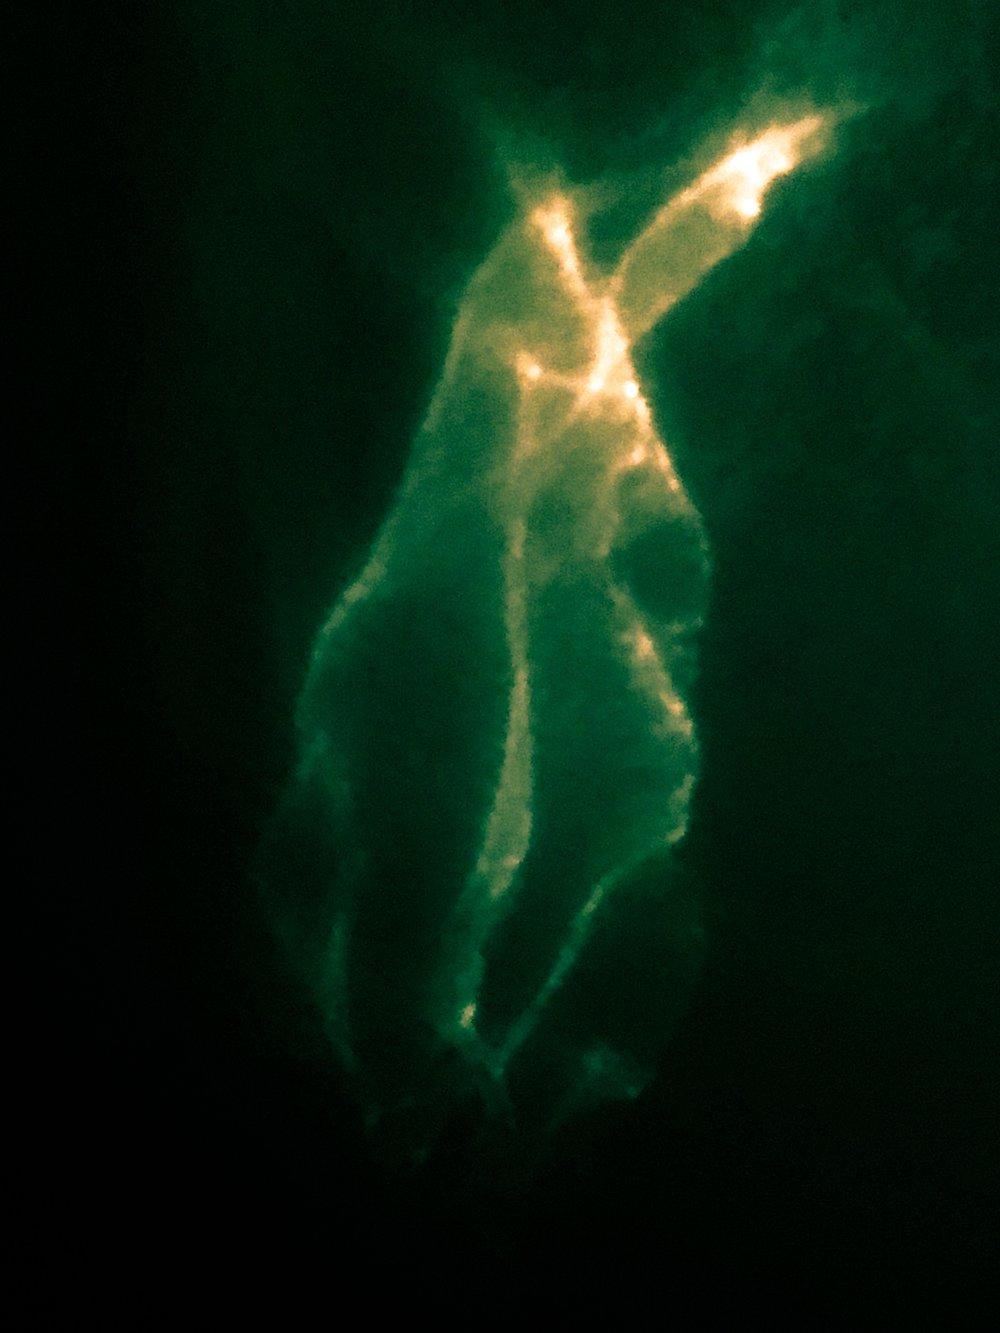 Cunt is Nebula